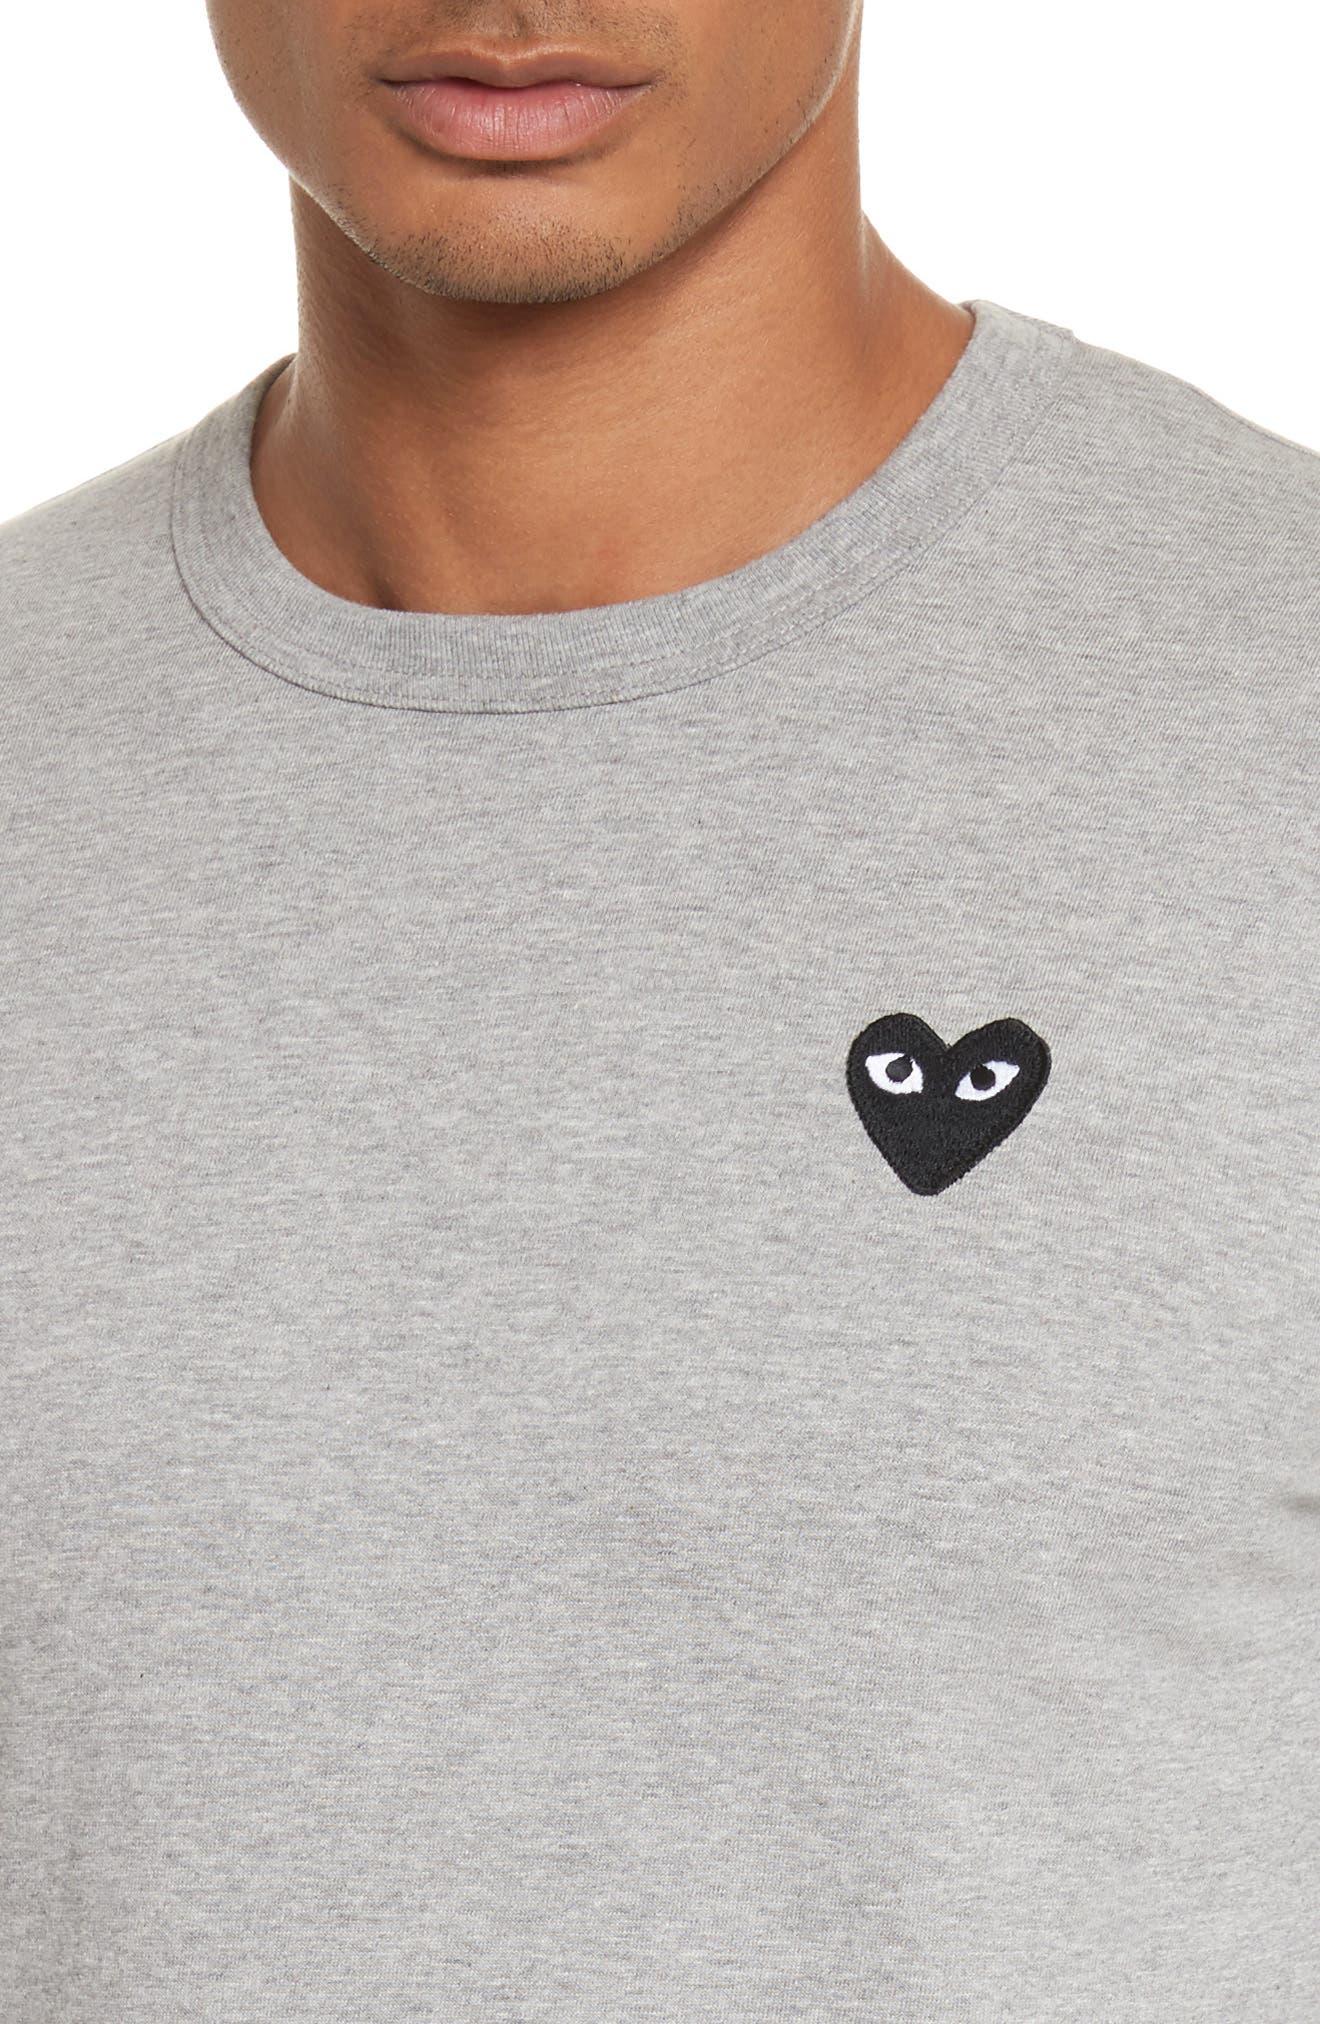 PLAY Long Sleeve T-Shirt,                             Alternate thumbnail 4, color,                             Grey